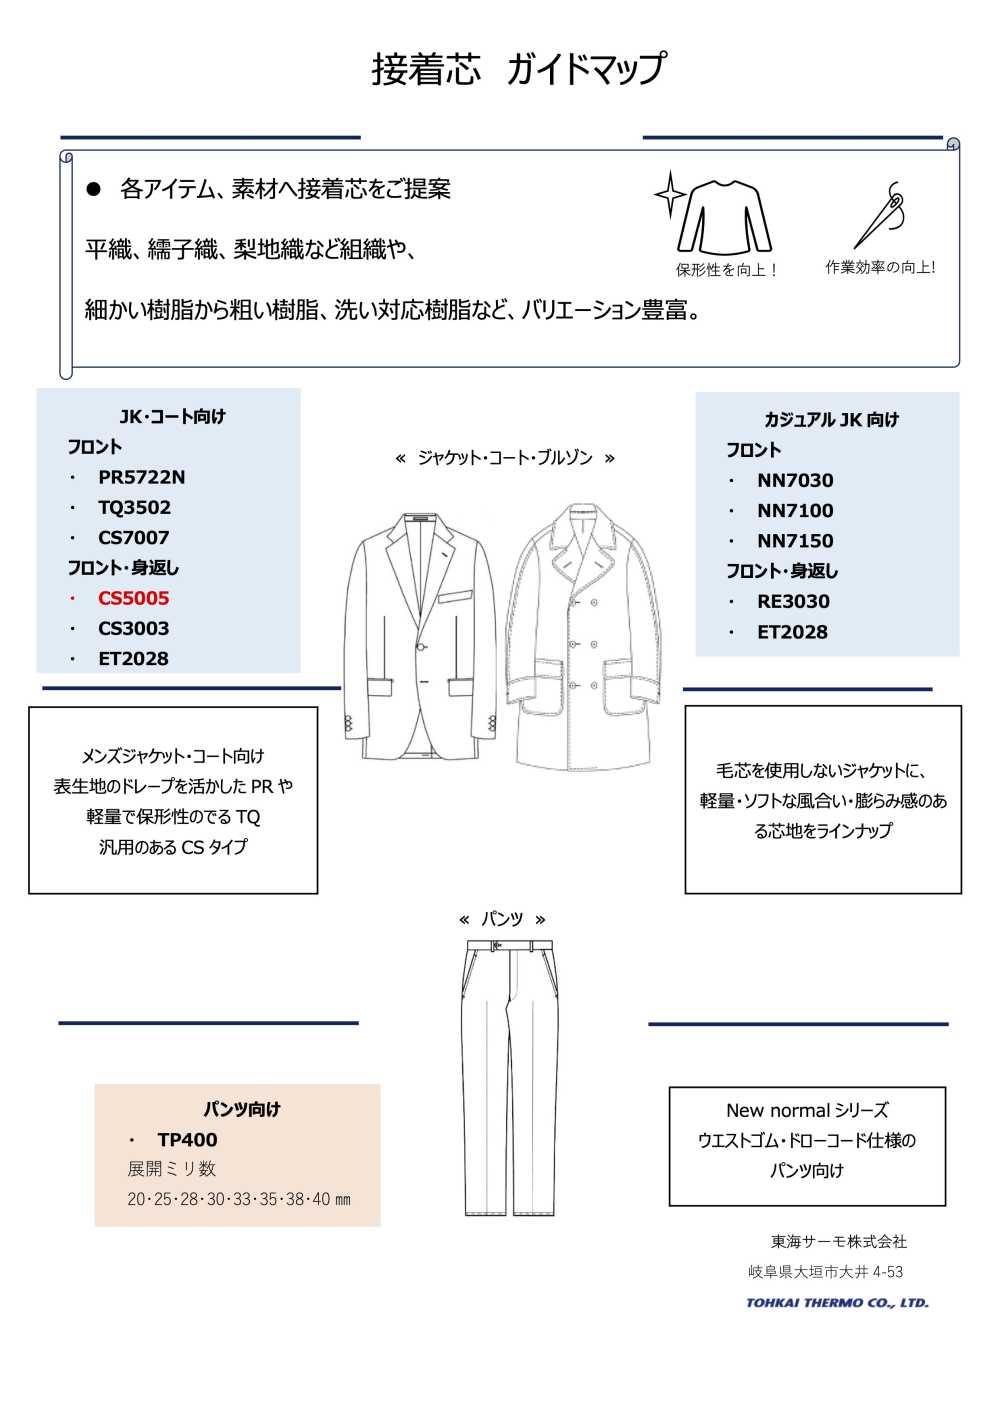 CS5005 ET・CSシリーズ<高汎用性接着芯>[芯地] 東海サーモ(Thermo)/オークラ商事 - ApparelX アパレル資材卸通販